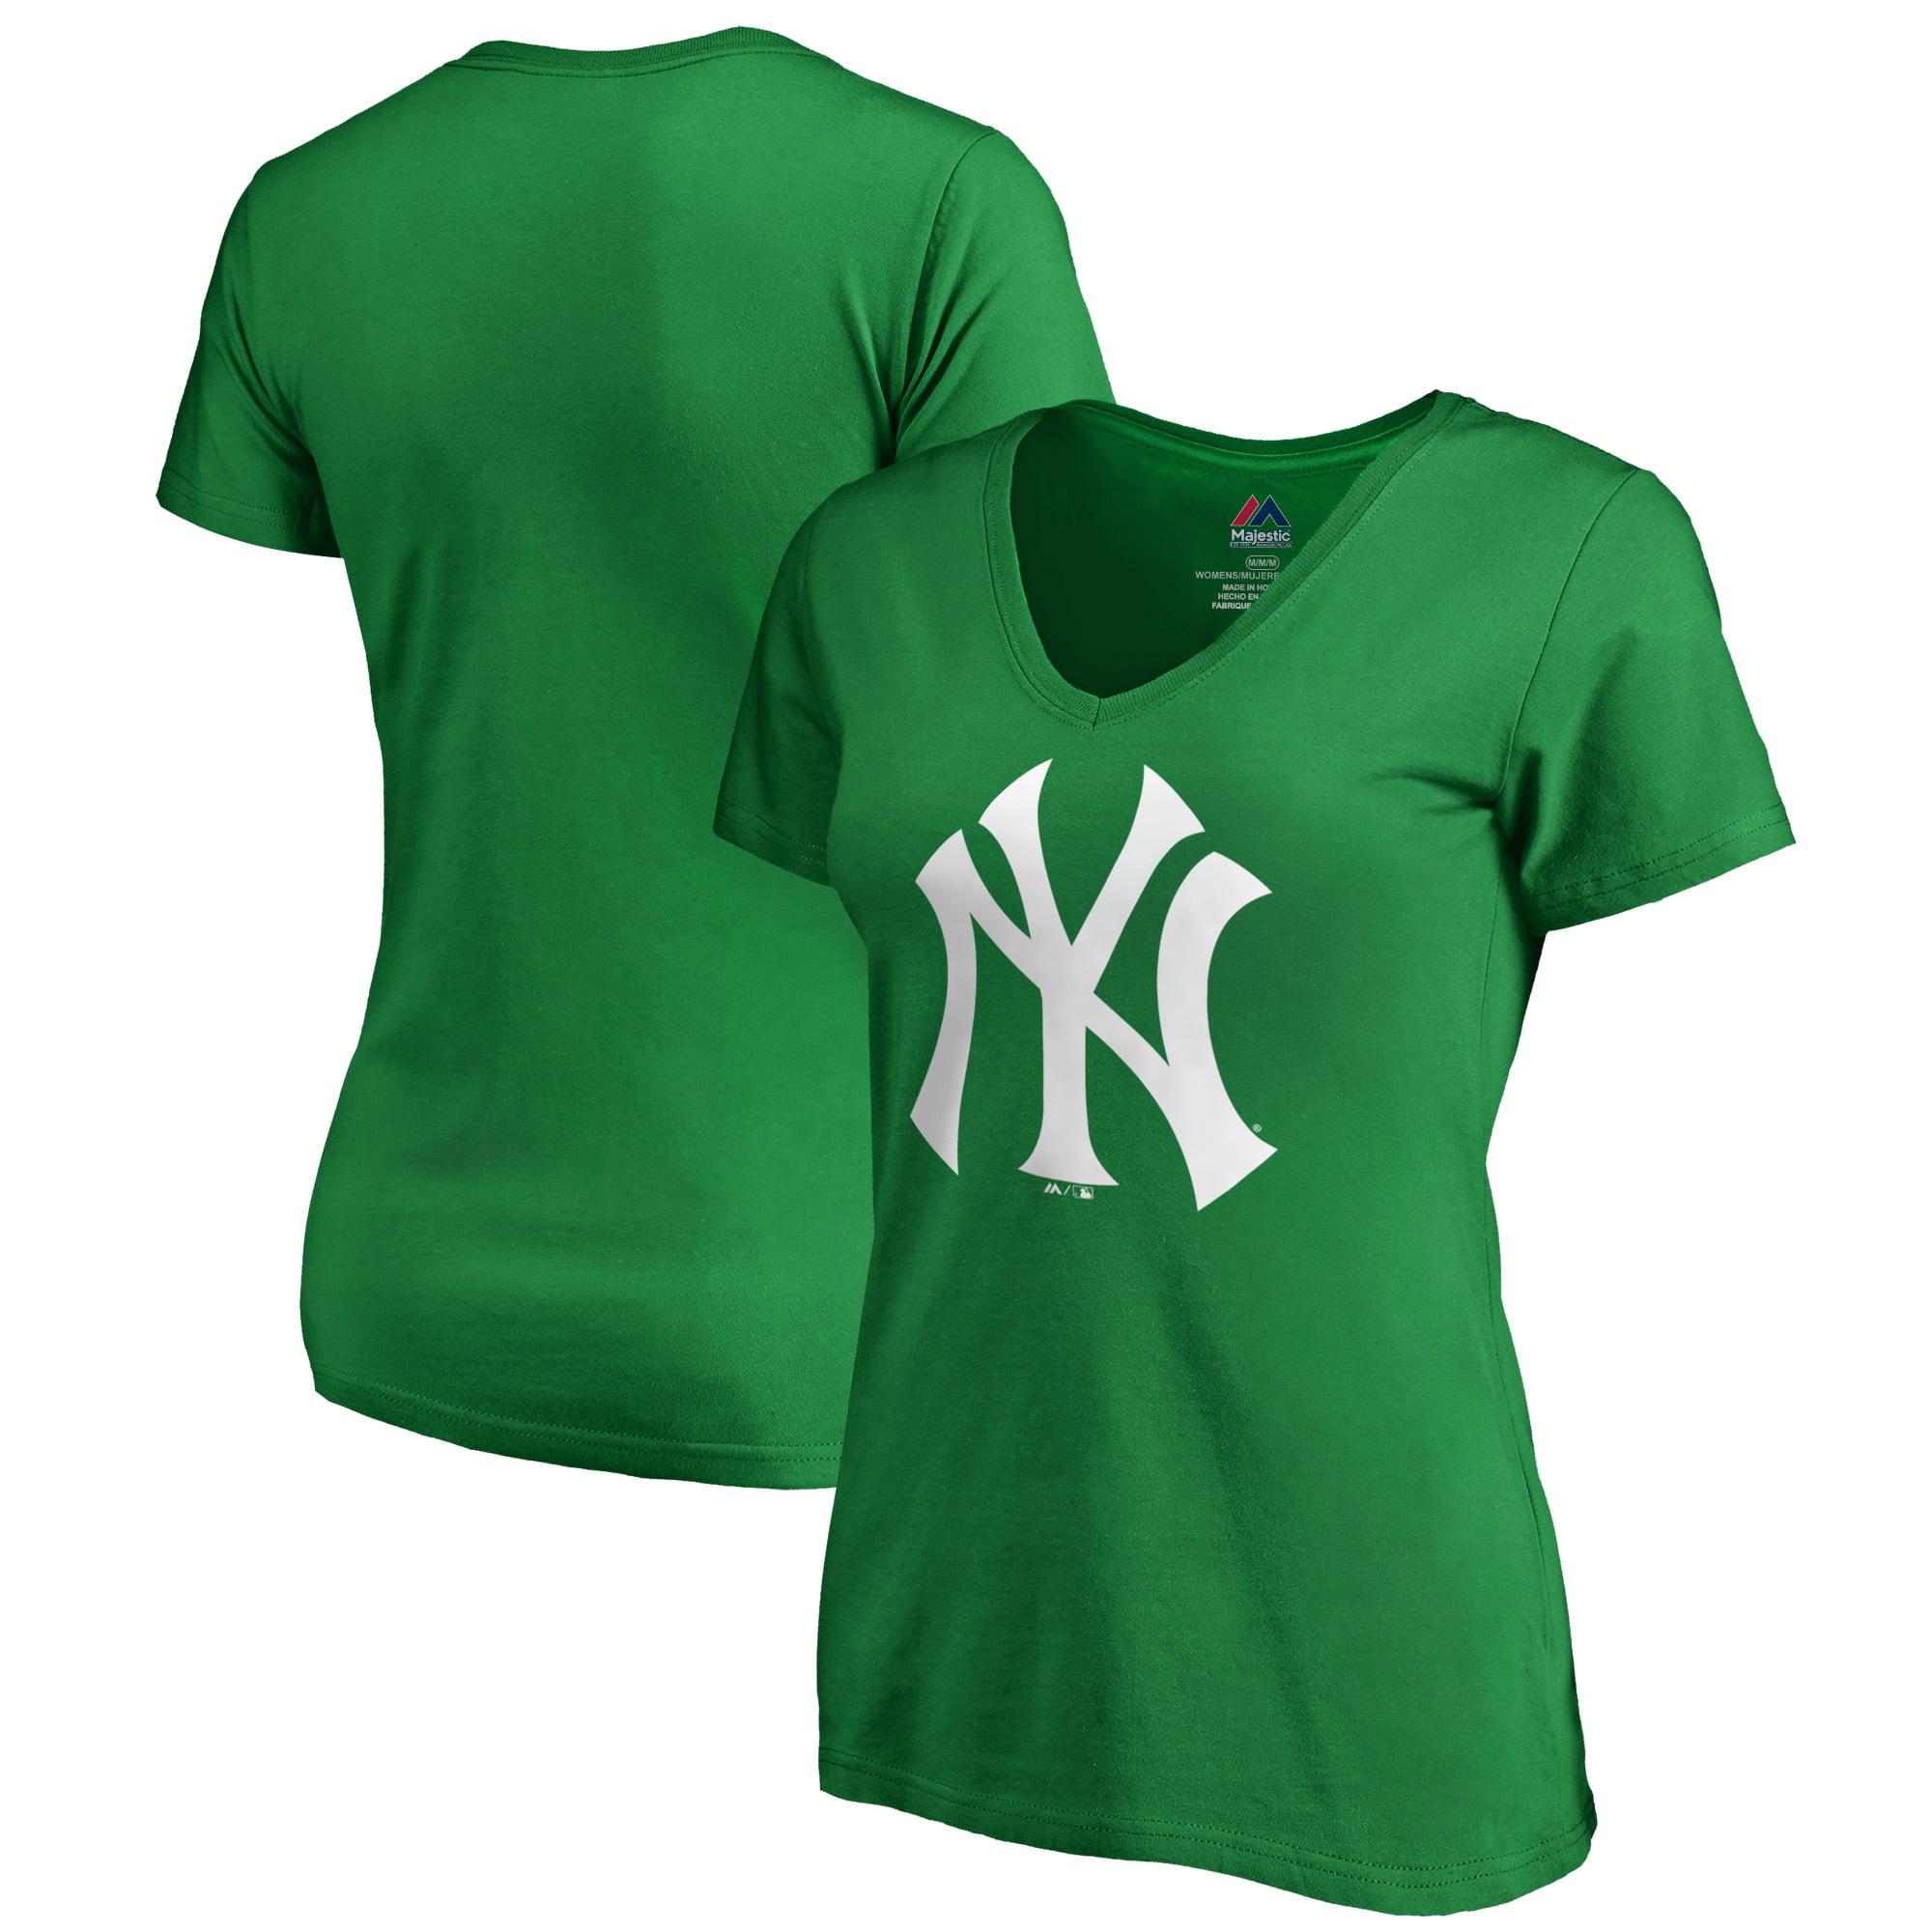 New York Yankees Majestic Women's St. Patrick's Day White Logo V-Neck T-Shirt - Kelly Green